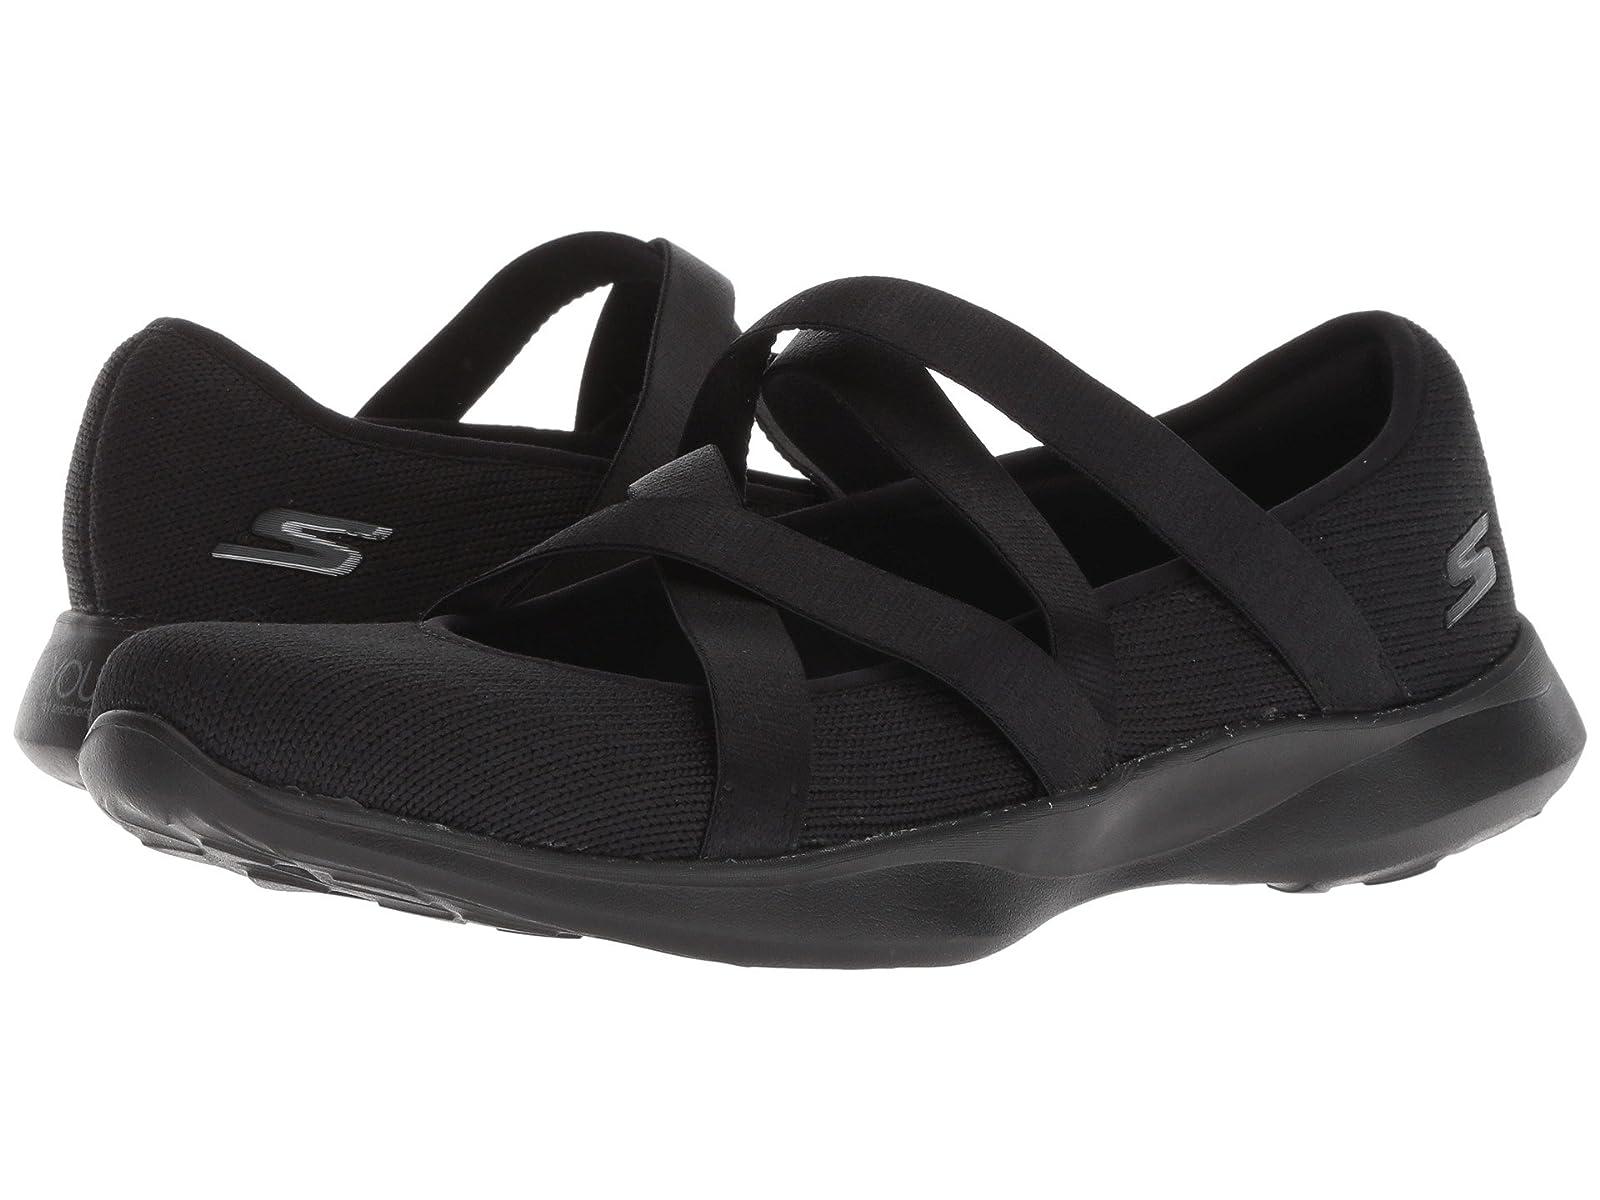 SKECHERS Performance Serene - 15847Atmospheric grades have affordable shoes